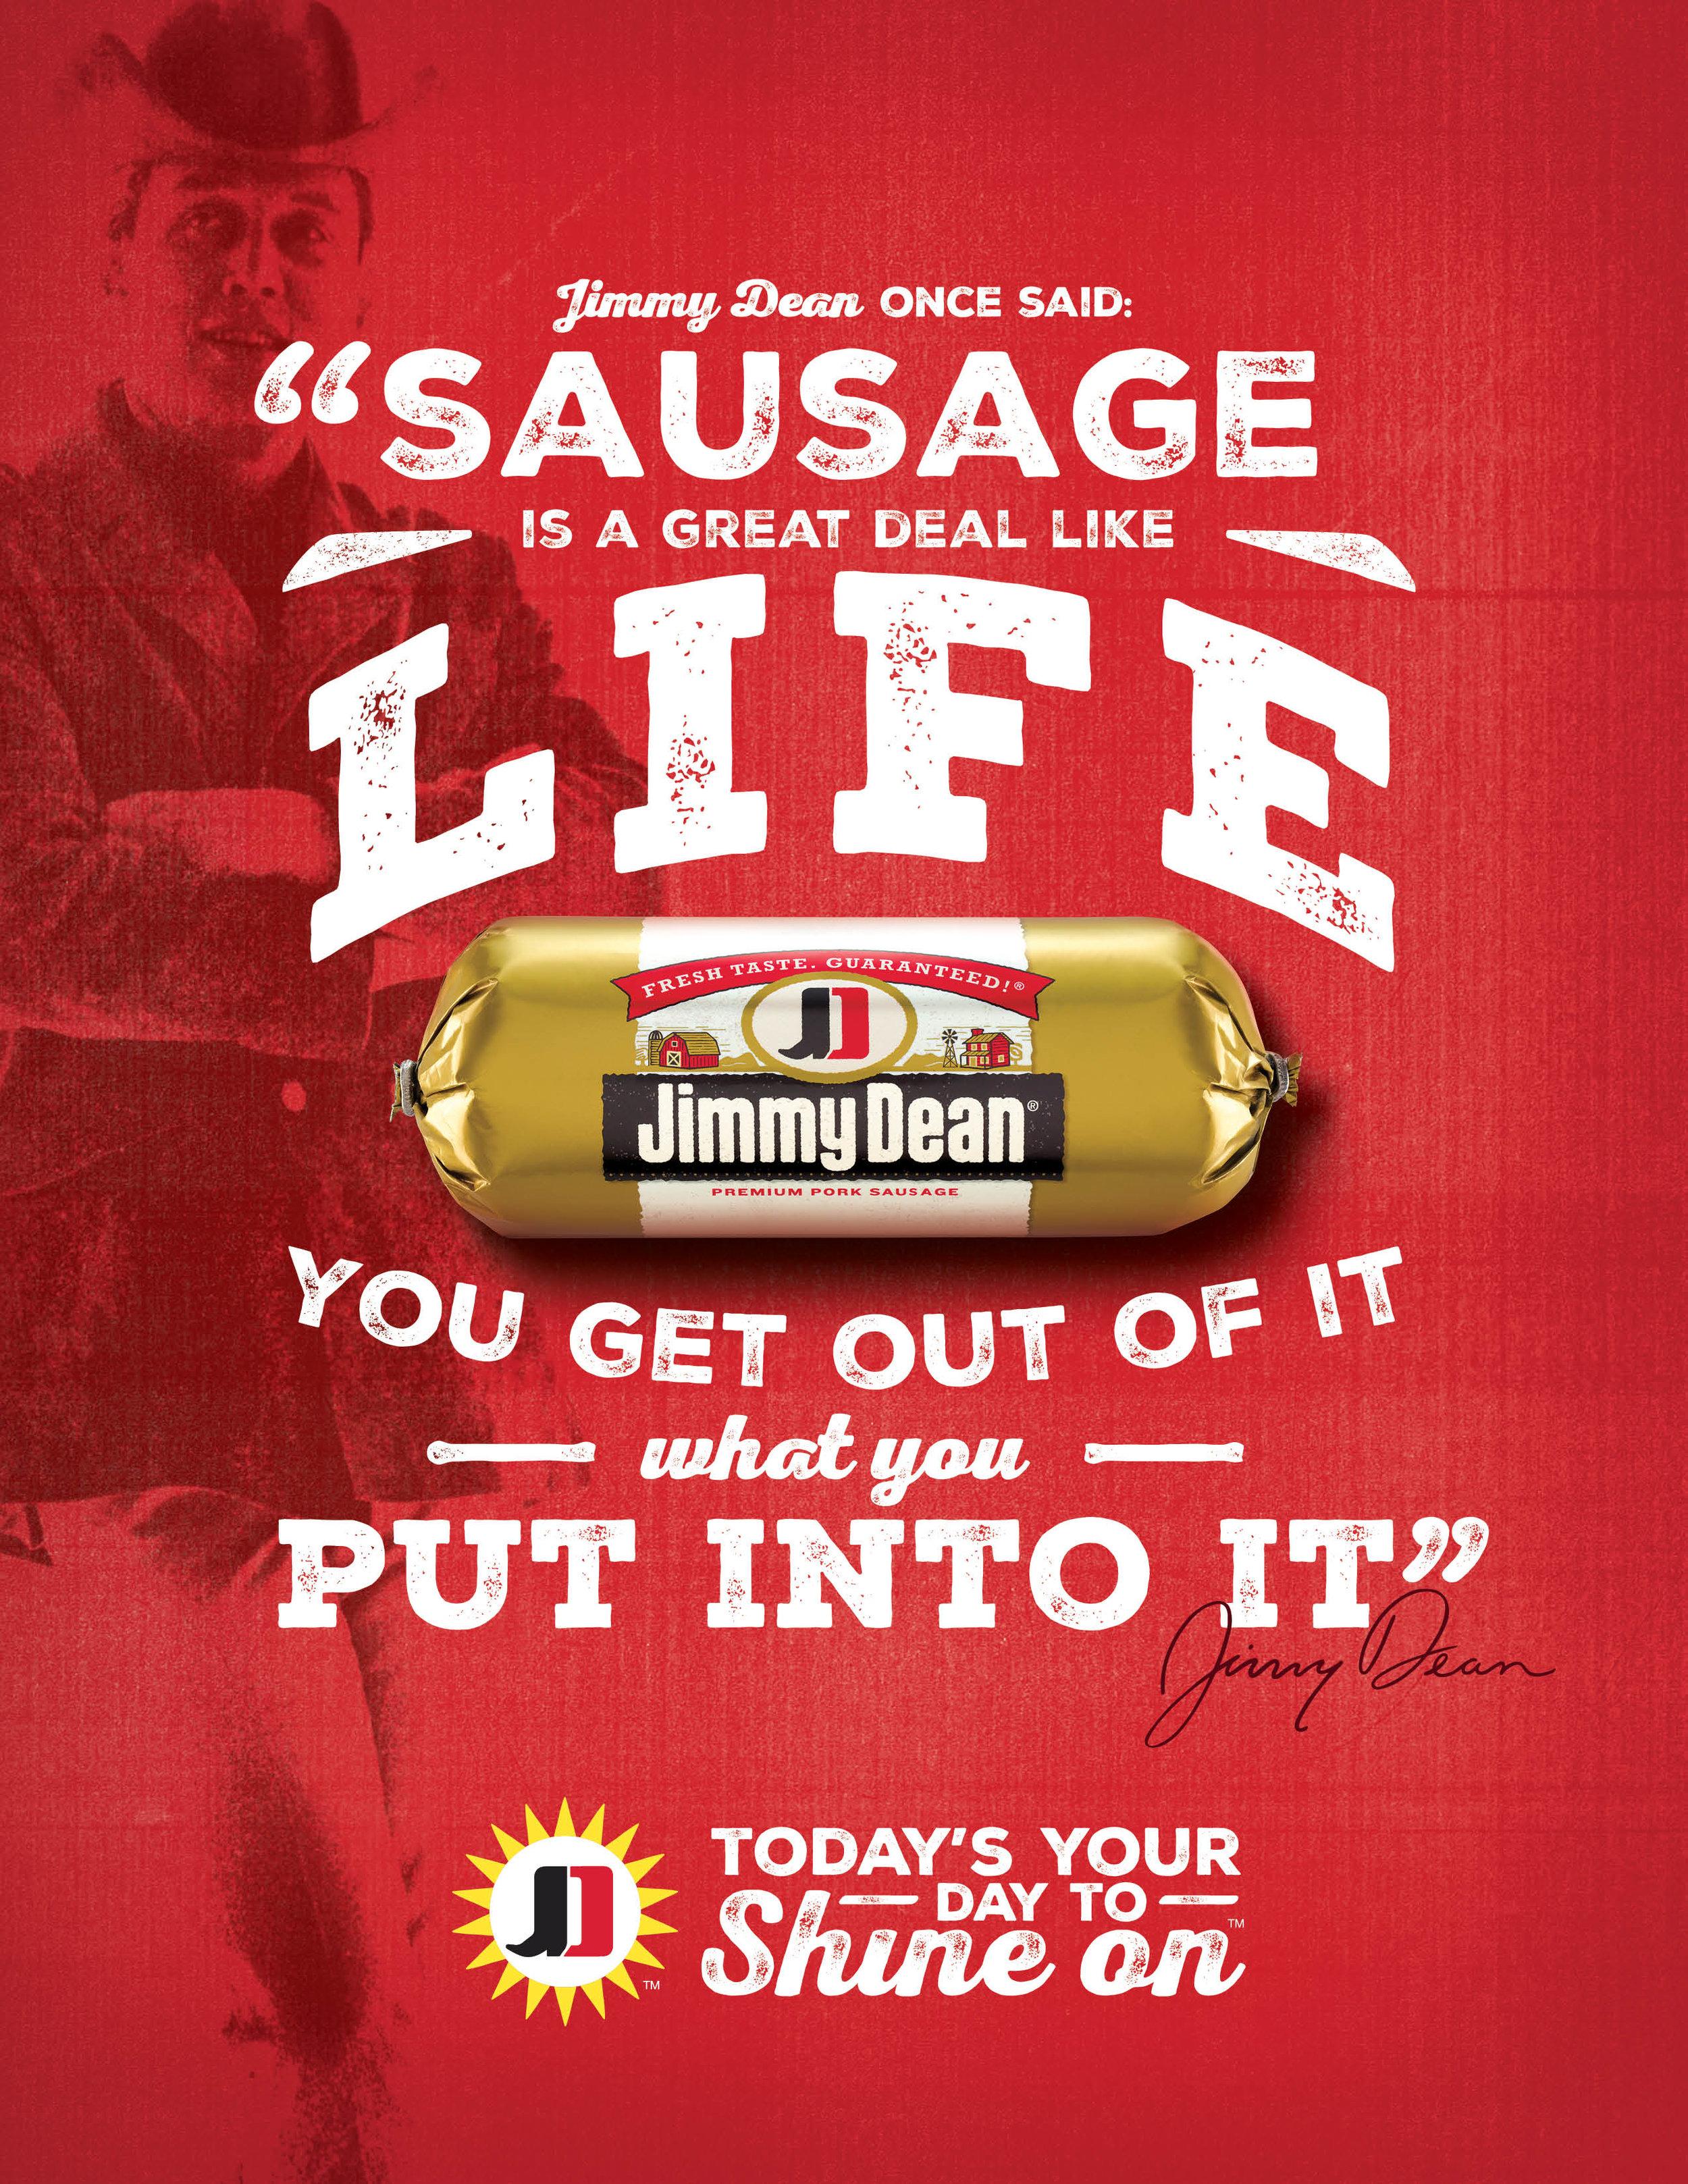 SausagePrint.jpg